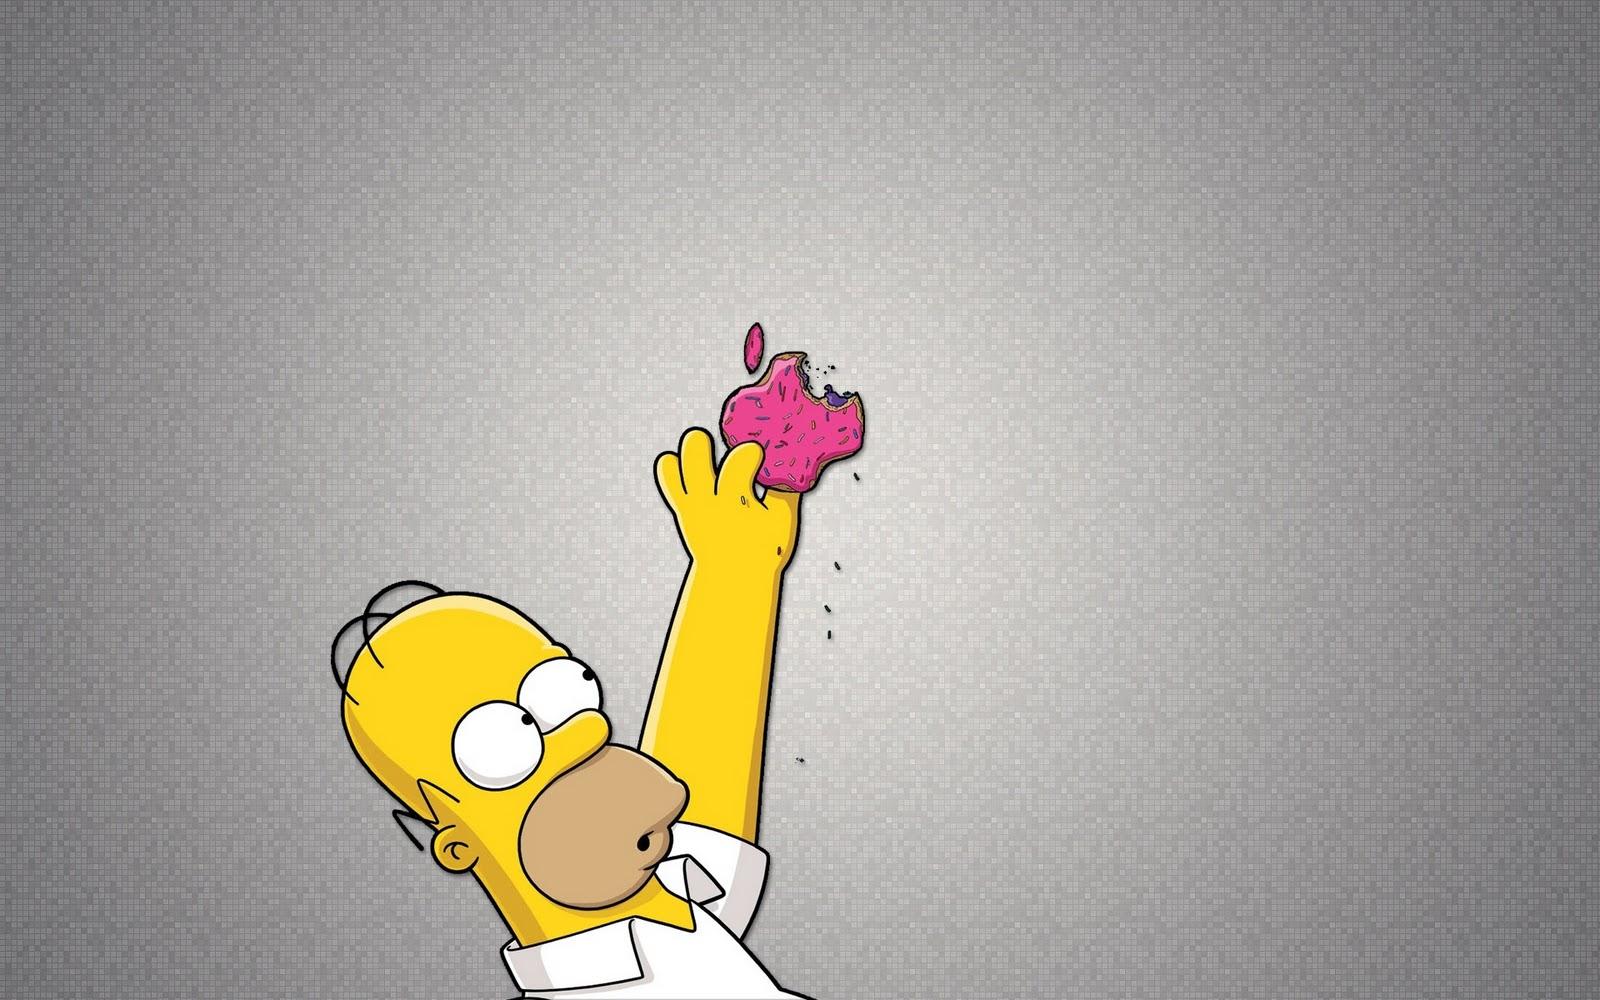 simpsons wallpapers simpsons wallpaper 17 homer simpson apple logo 1600x1000